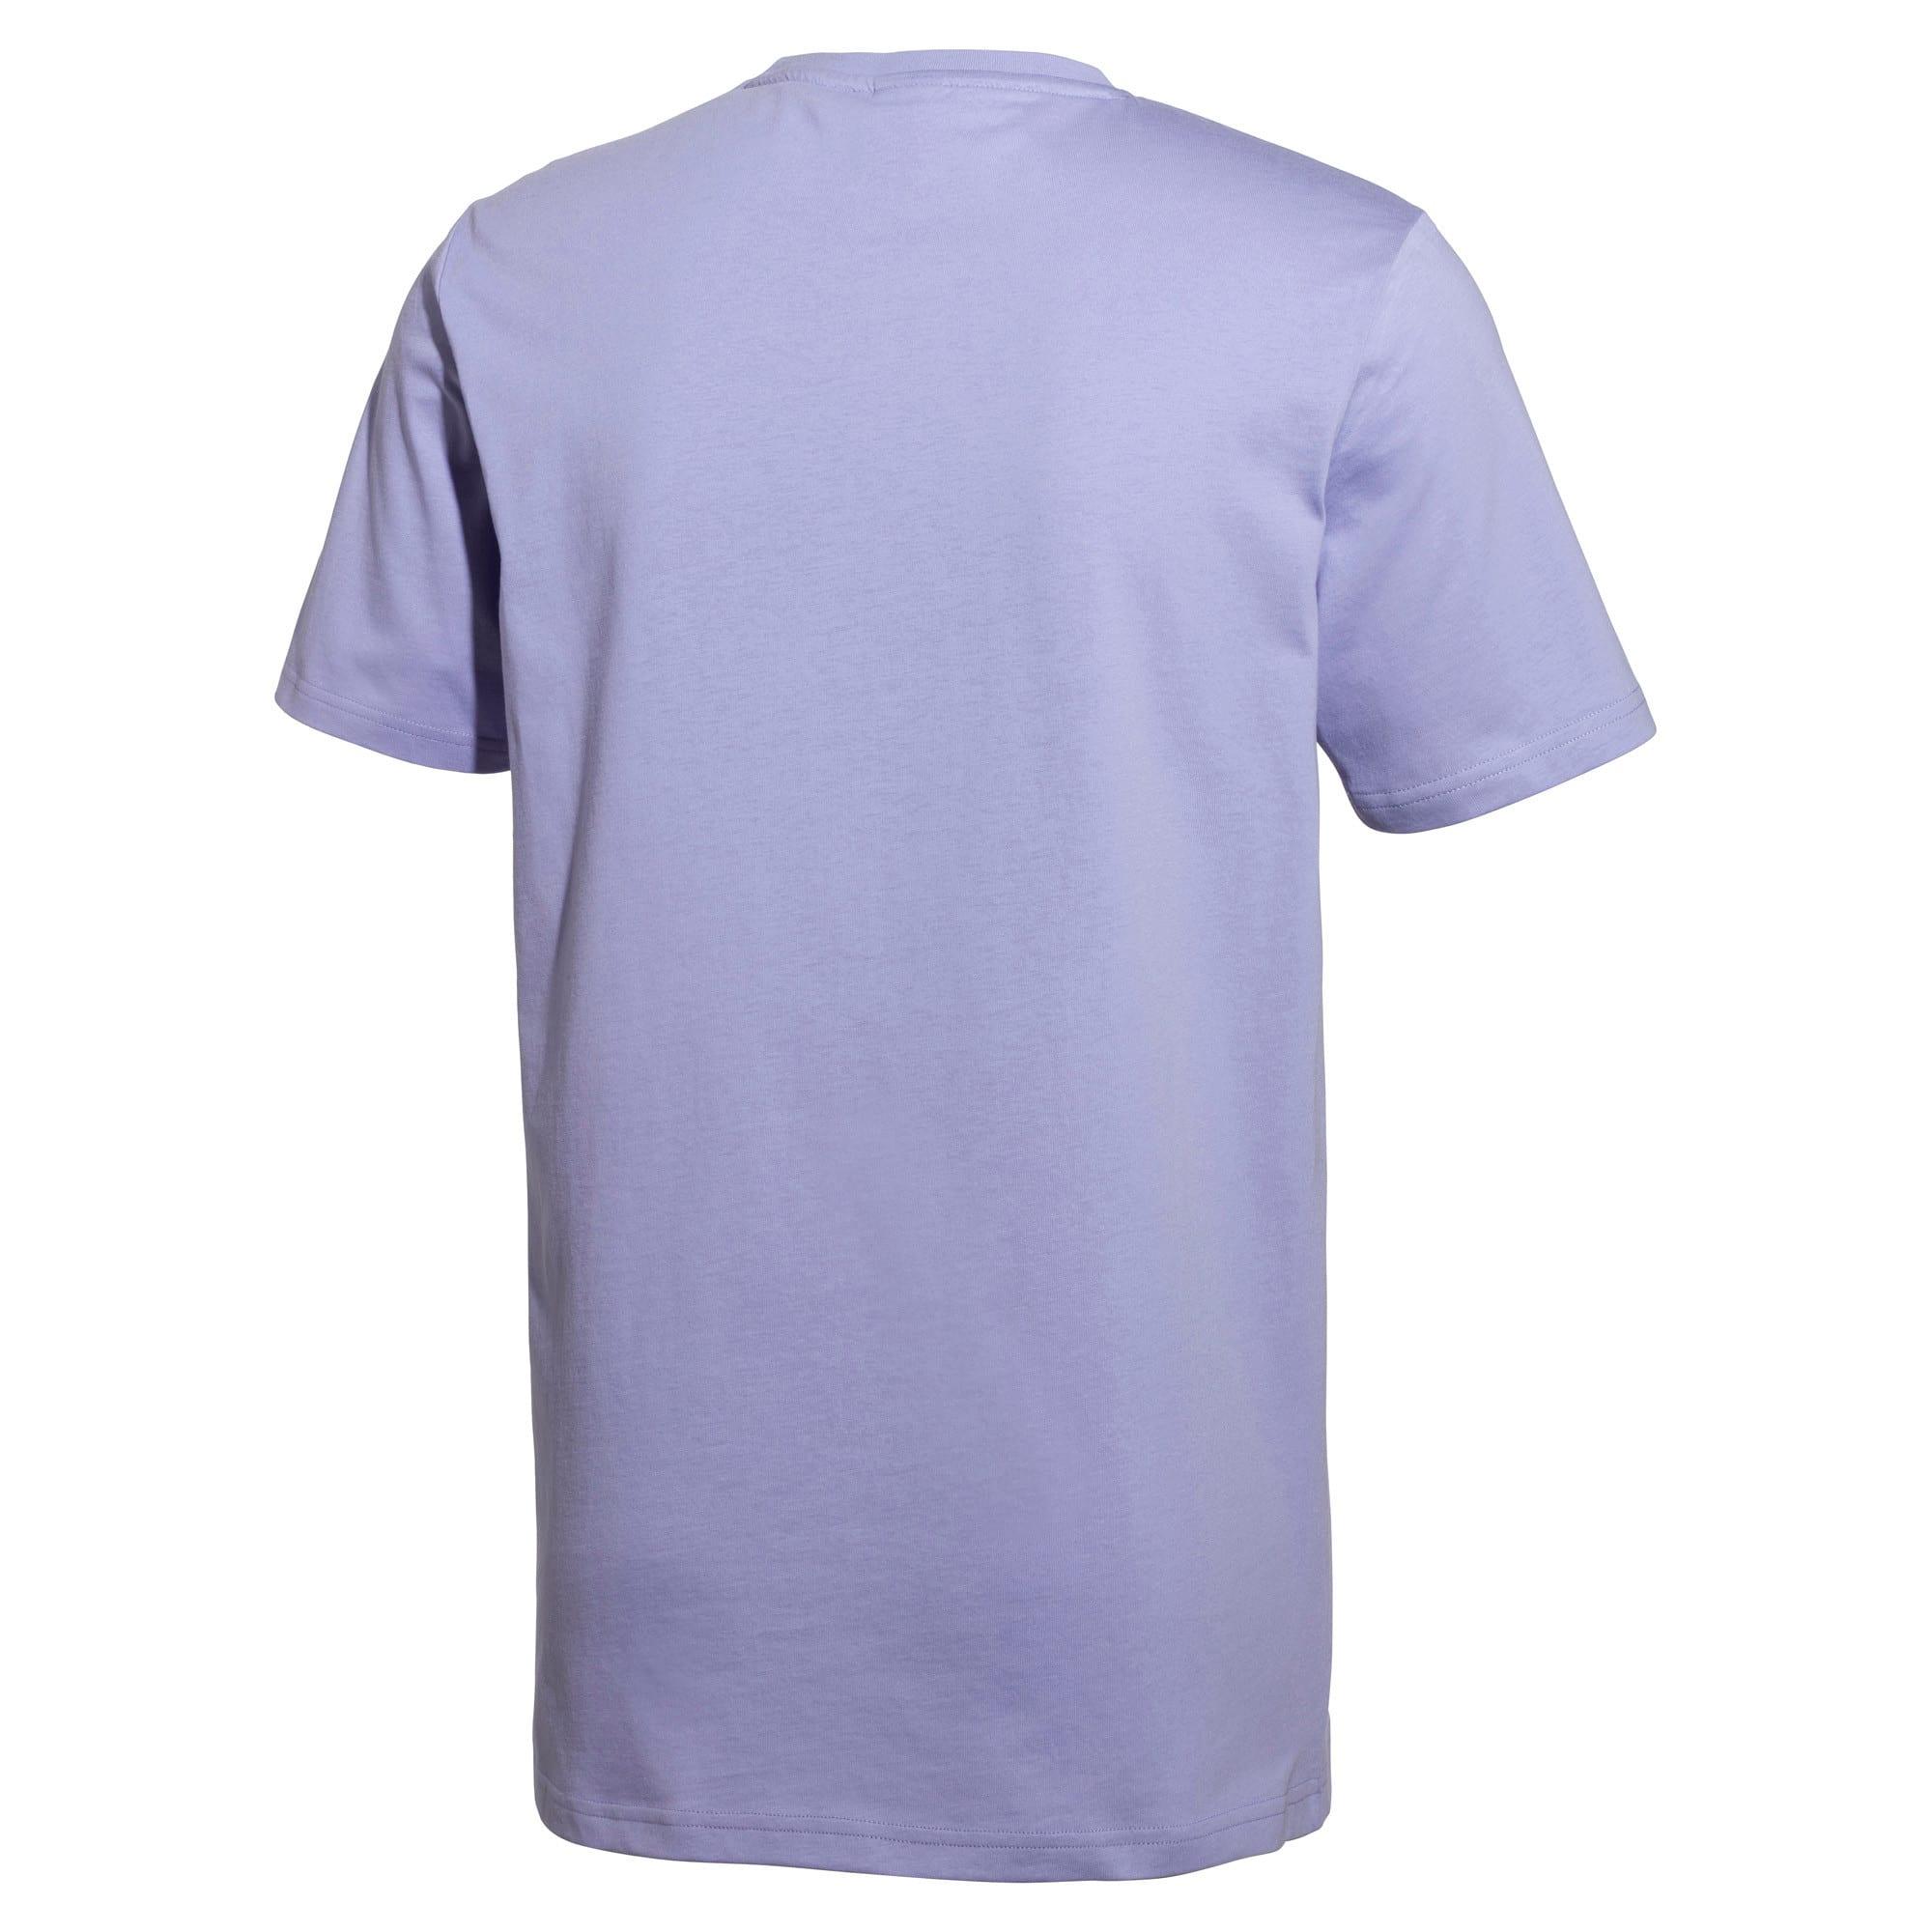 Miniatura 2 de Camiseta PUMA x MTV para hombre, Sweet Lavender, mediano